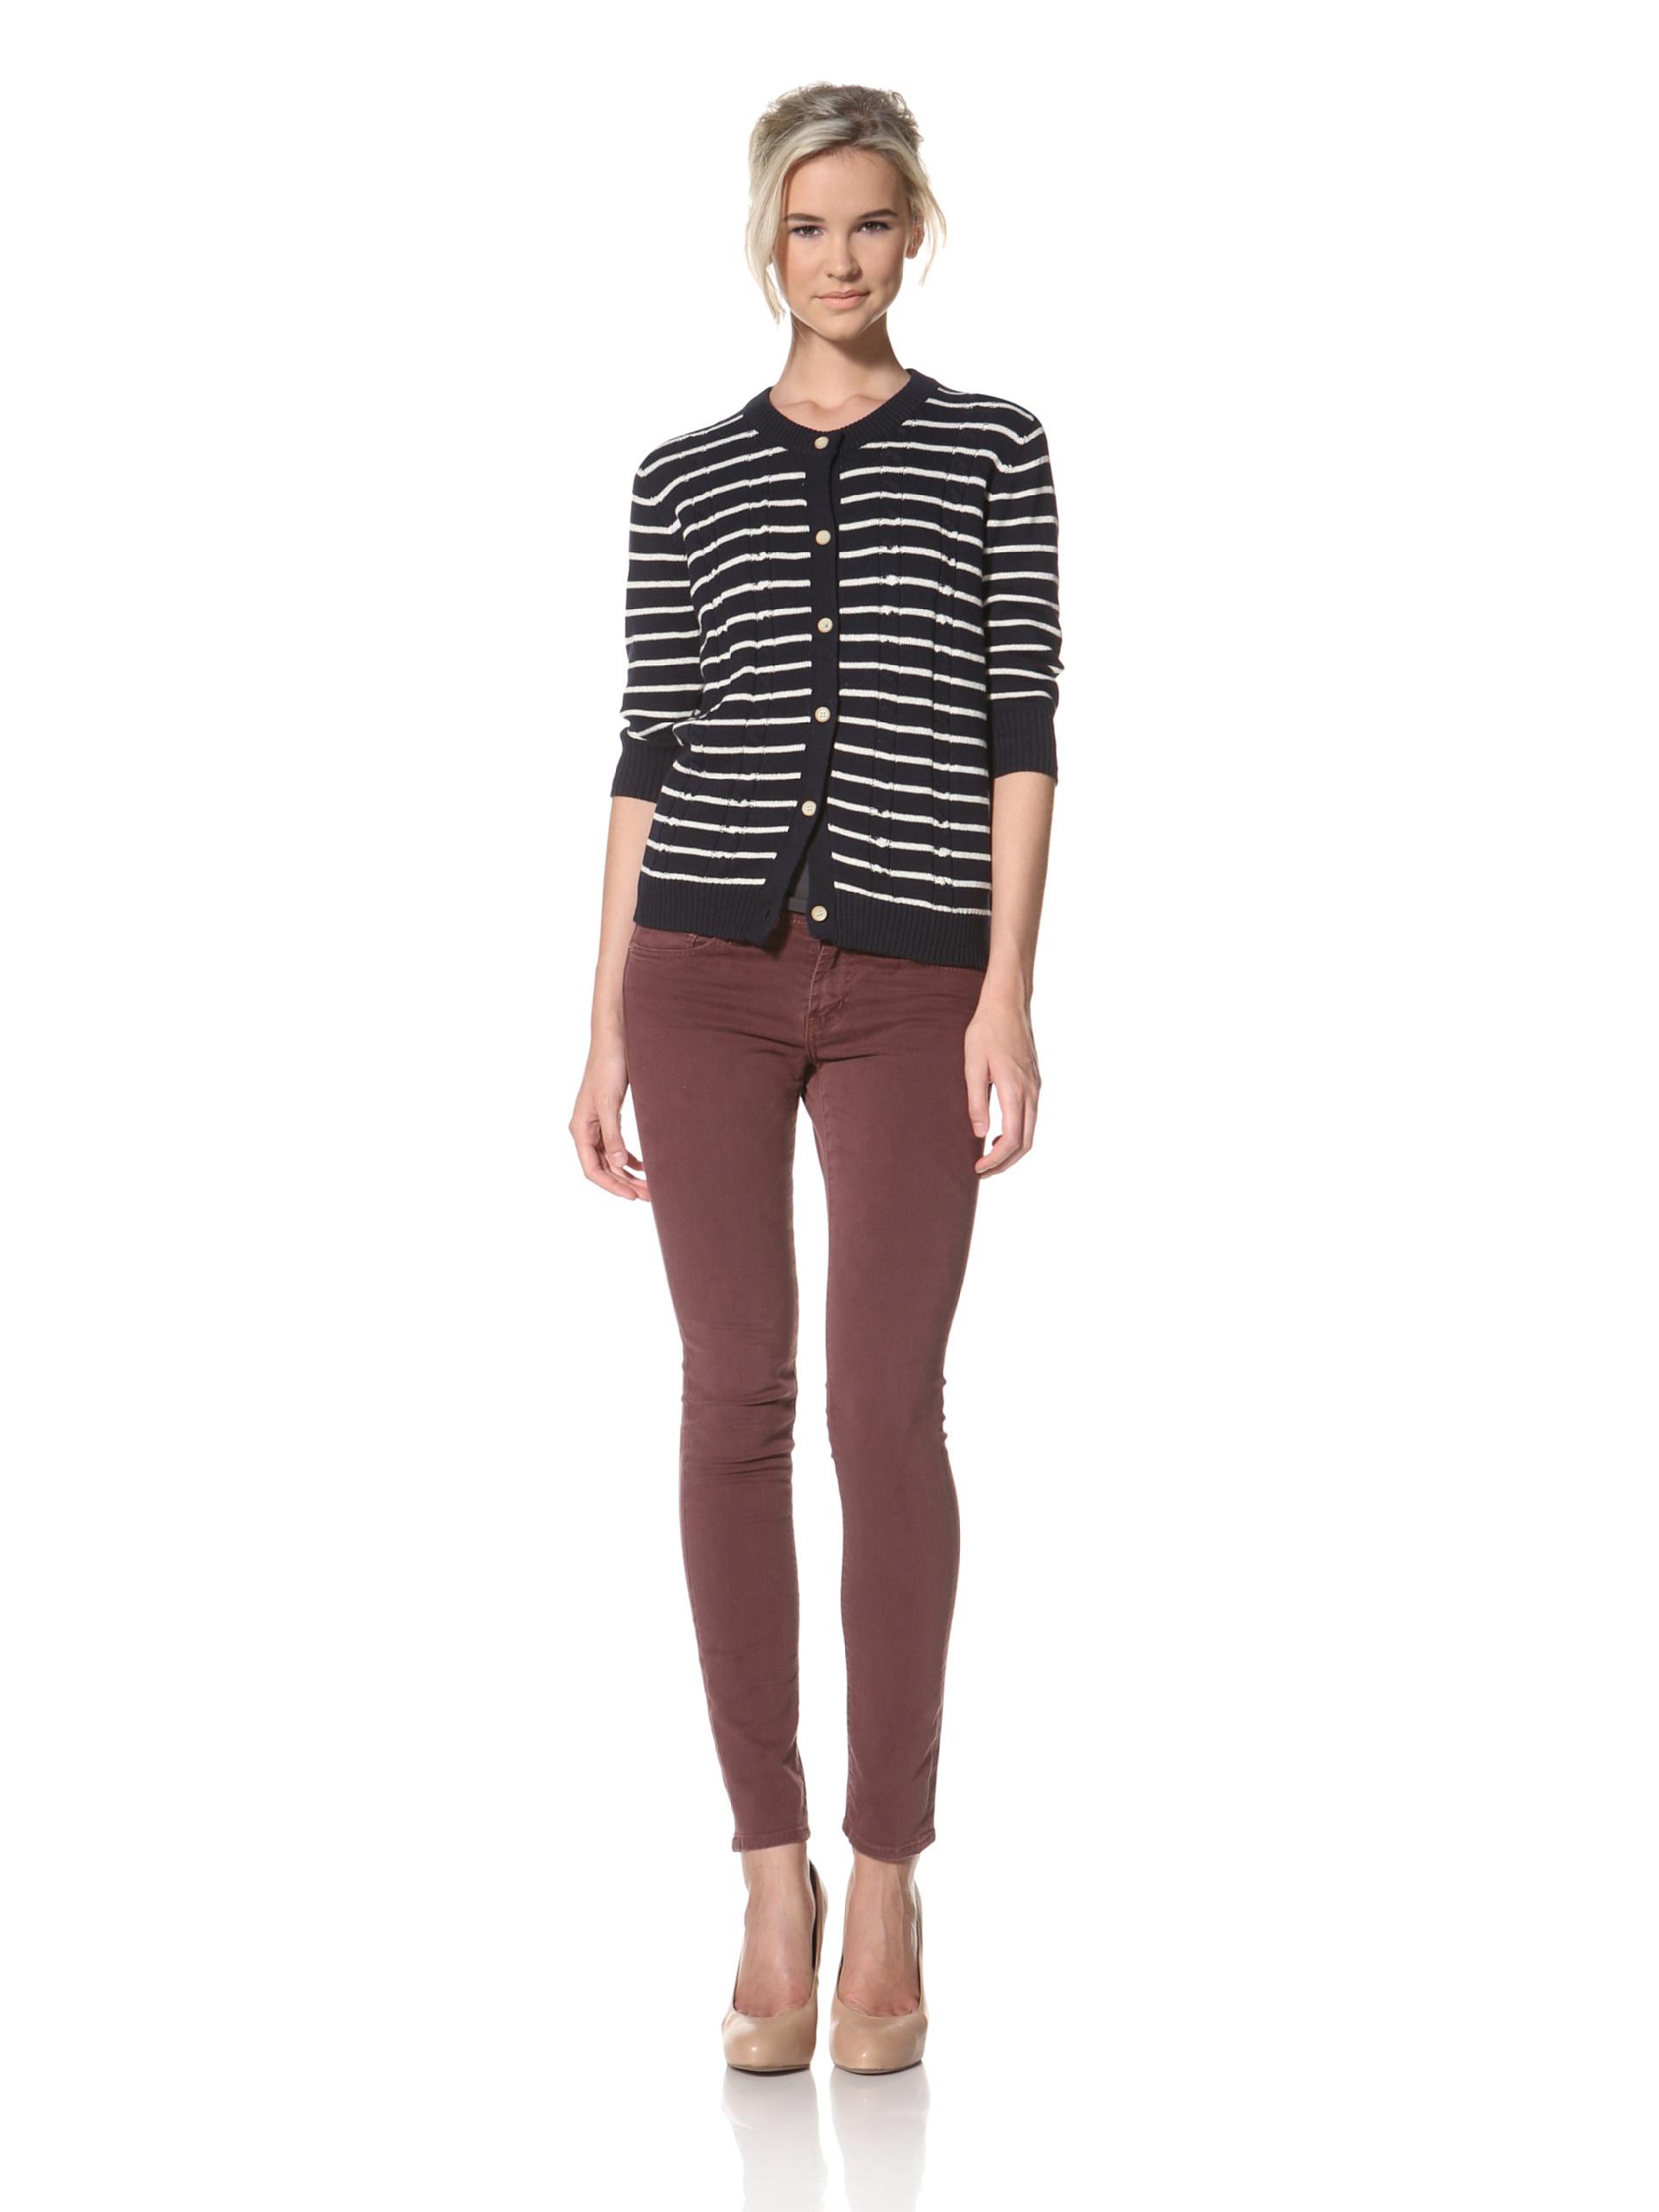 Trovata Women's Brigitte Cardigan Sweater (Navy/Multi Stripes)